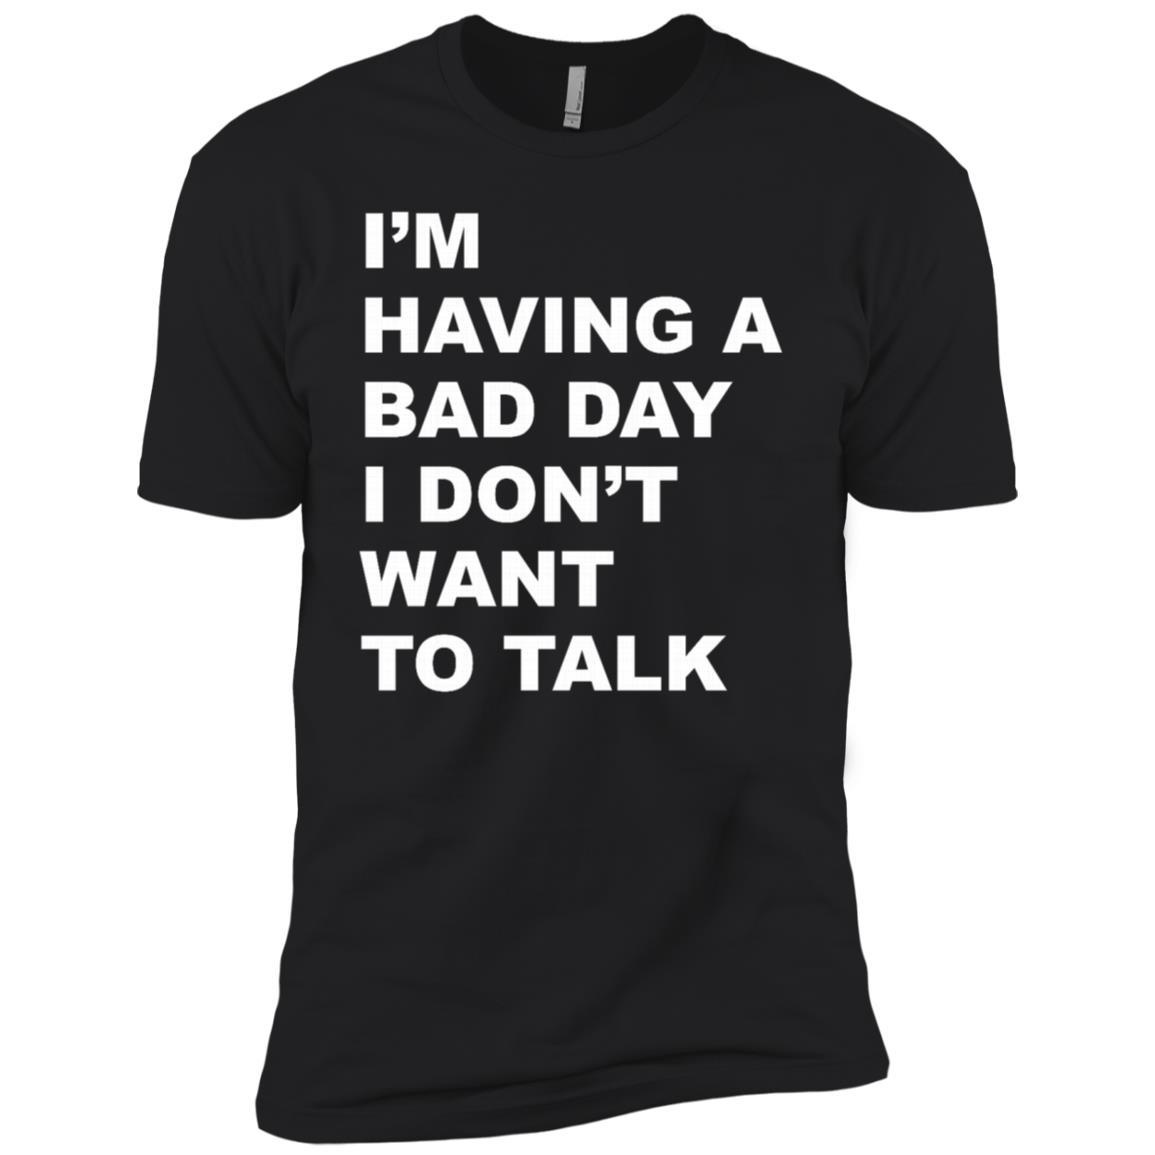 I'm having a bad day I don't want to talk Men Short Sleeve T-Shirt